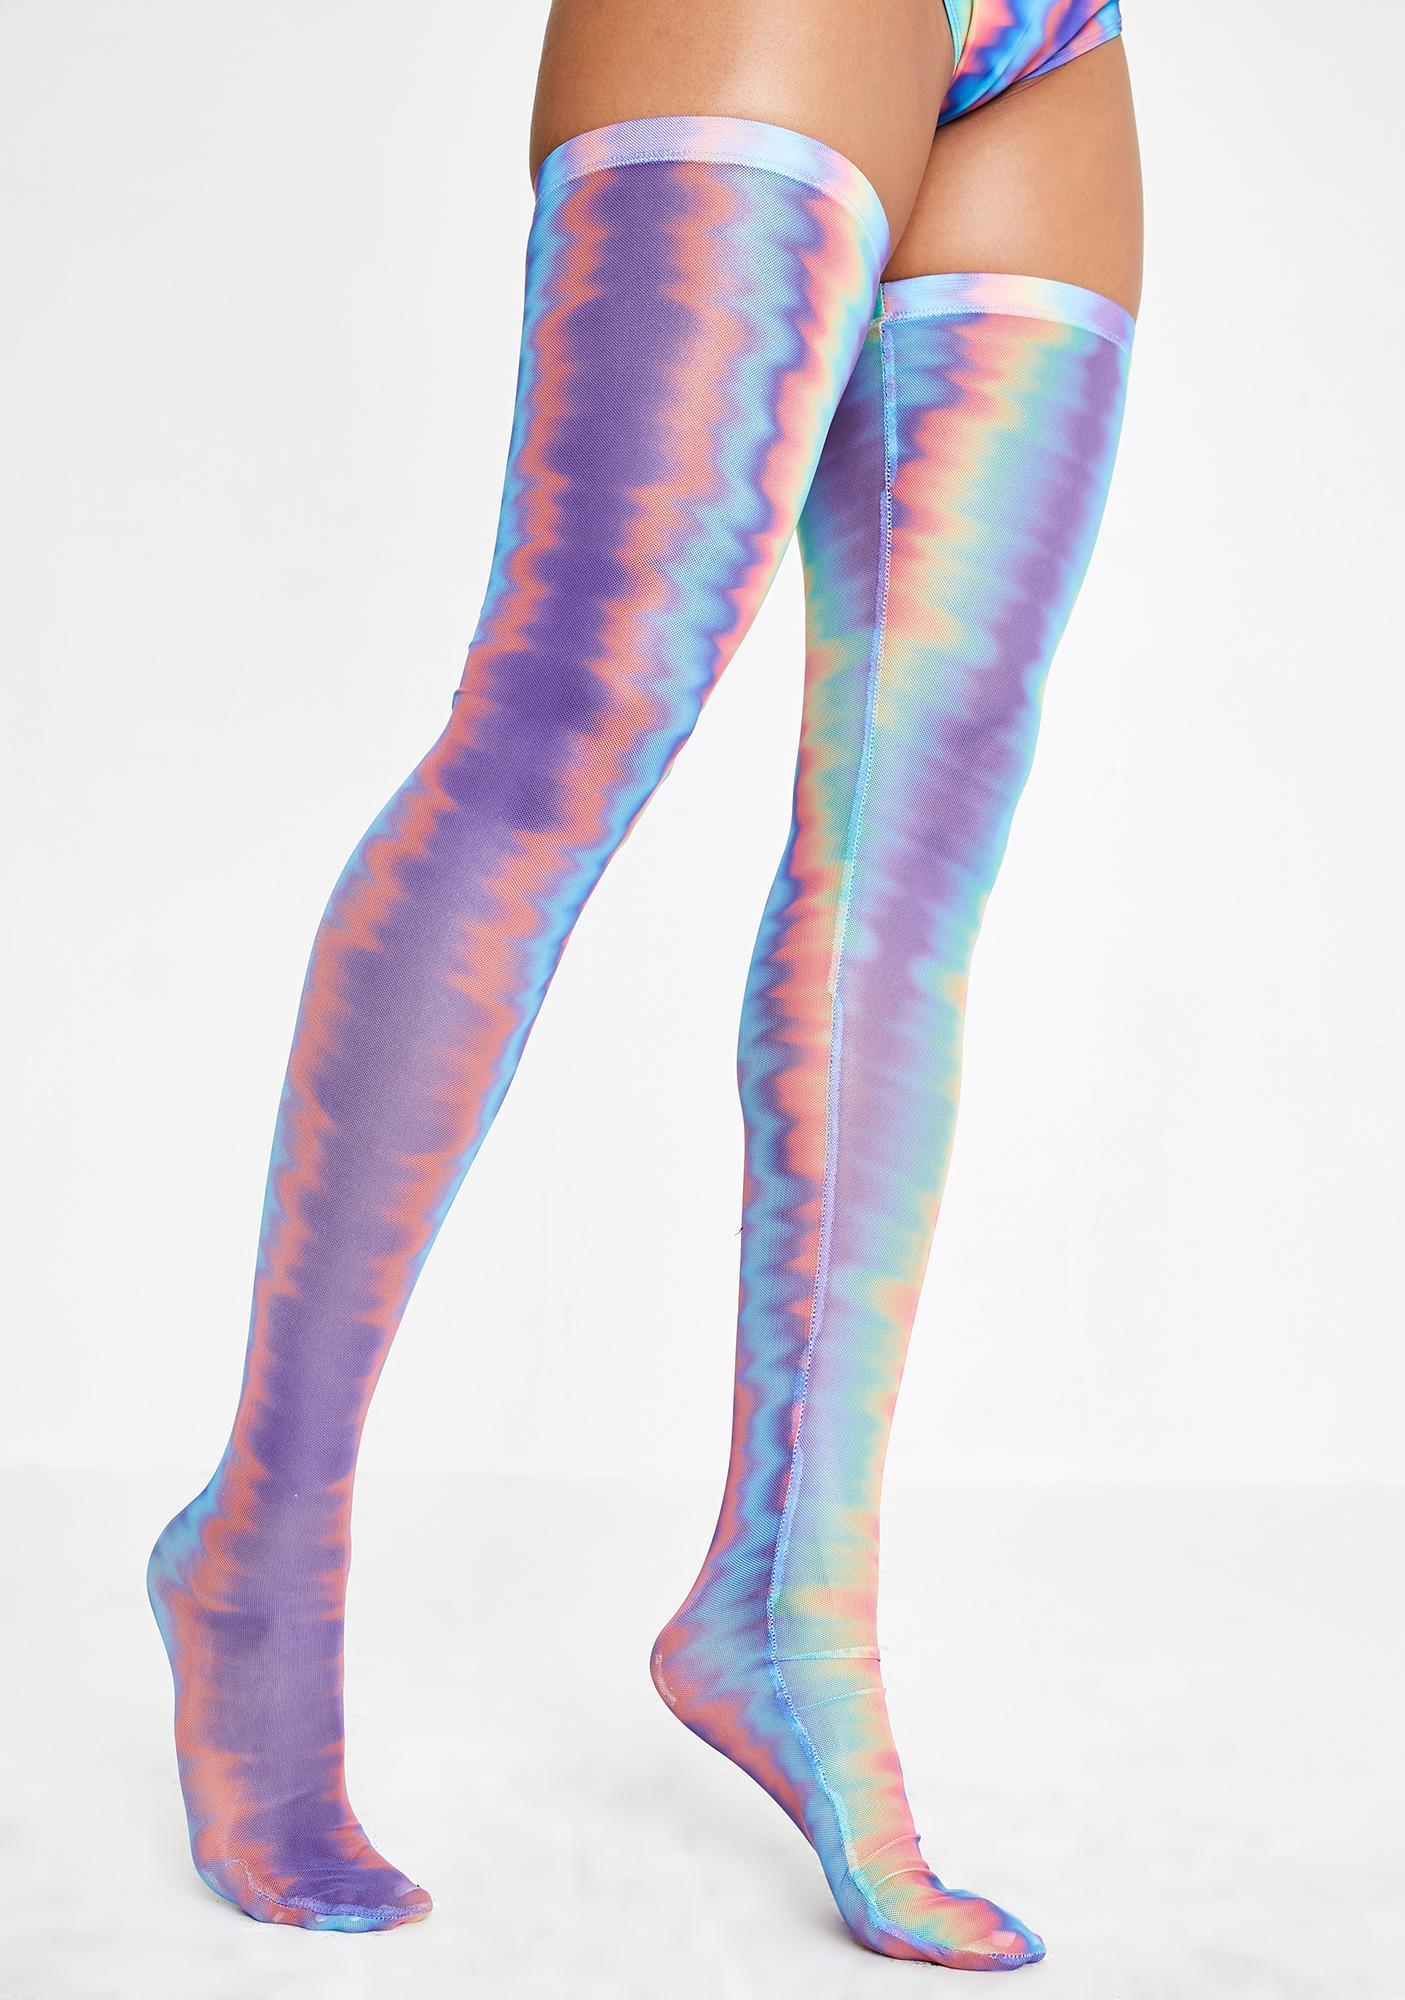 Club Exx Hypnotic Mist Mesh Stockings